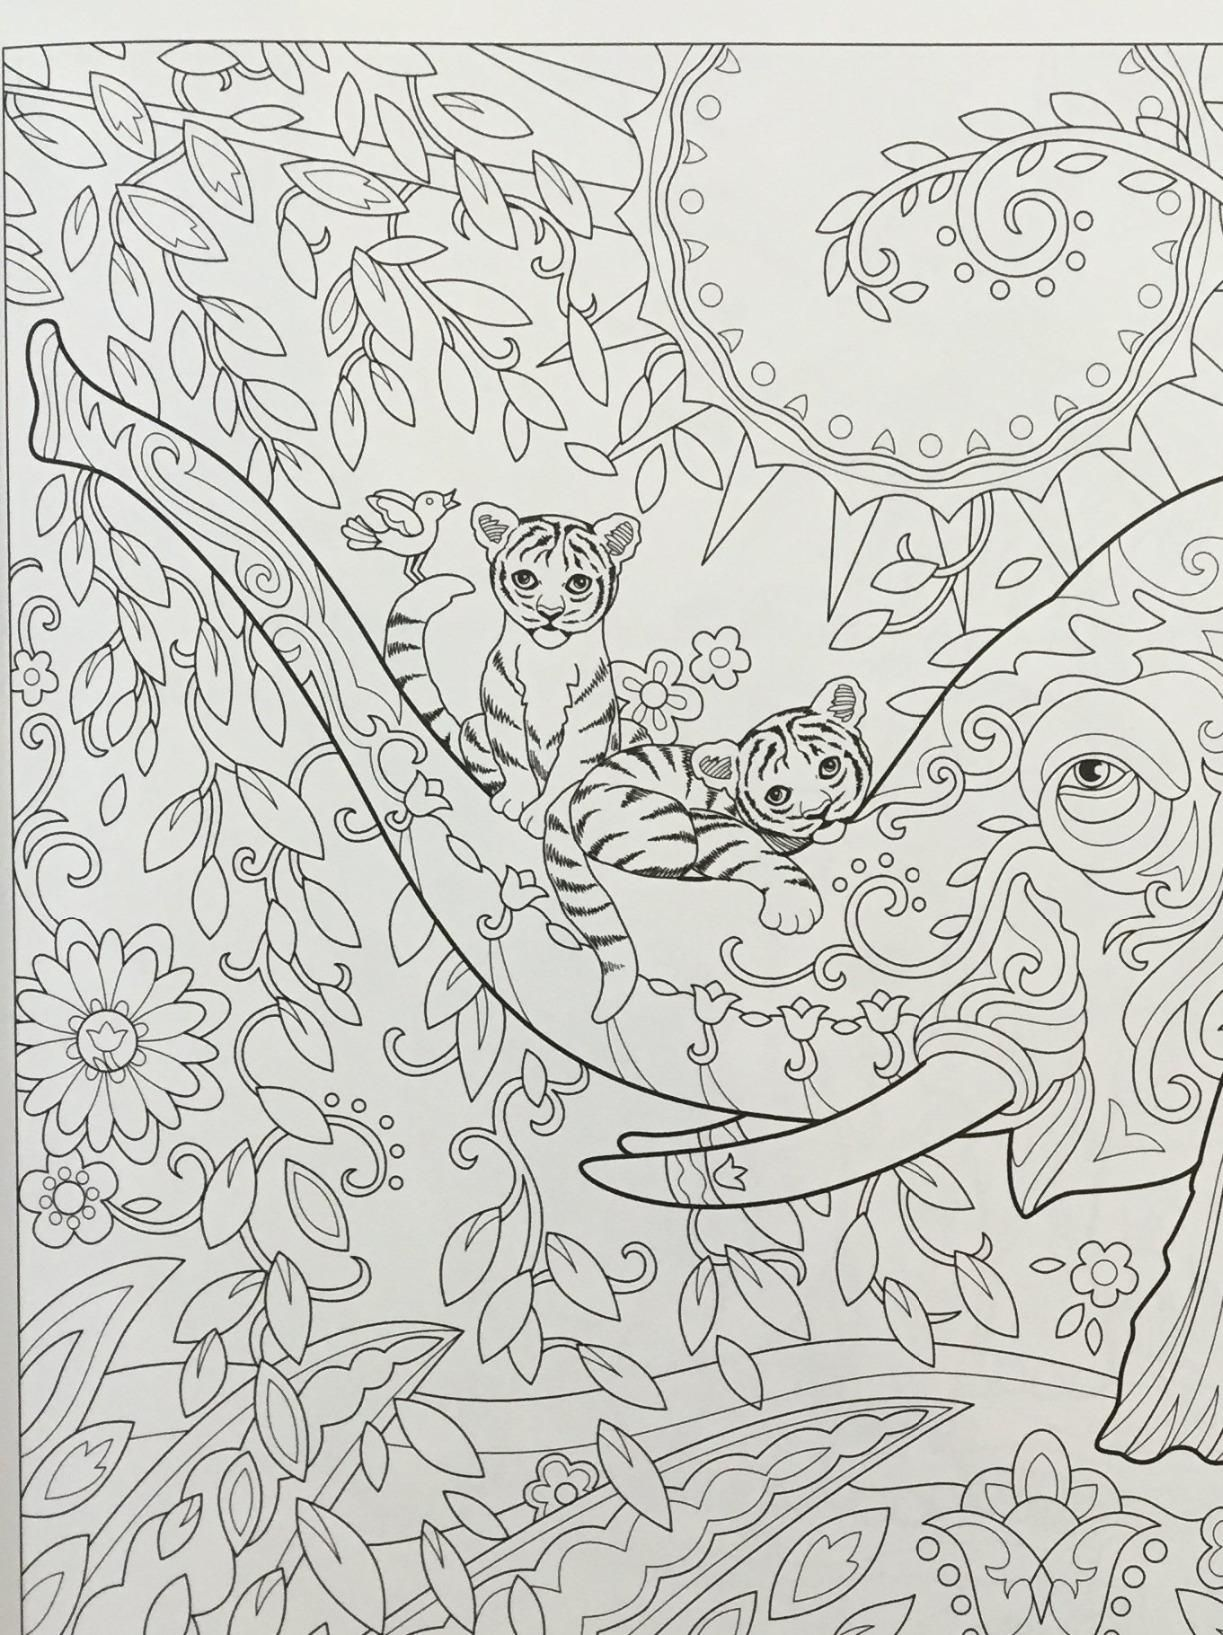 Amazon The Art of Marjorie Sarnat Elegant Elephants Adult Coloring book Coloriage AdulteColoriagesColoriage AdultesLivres